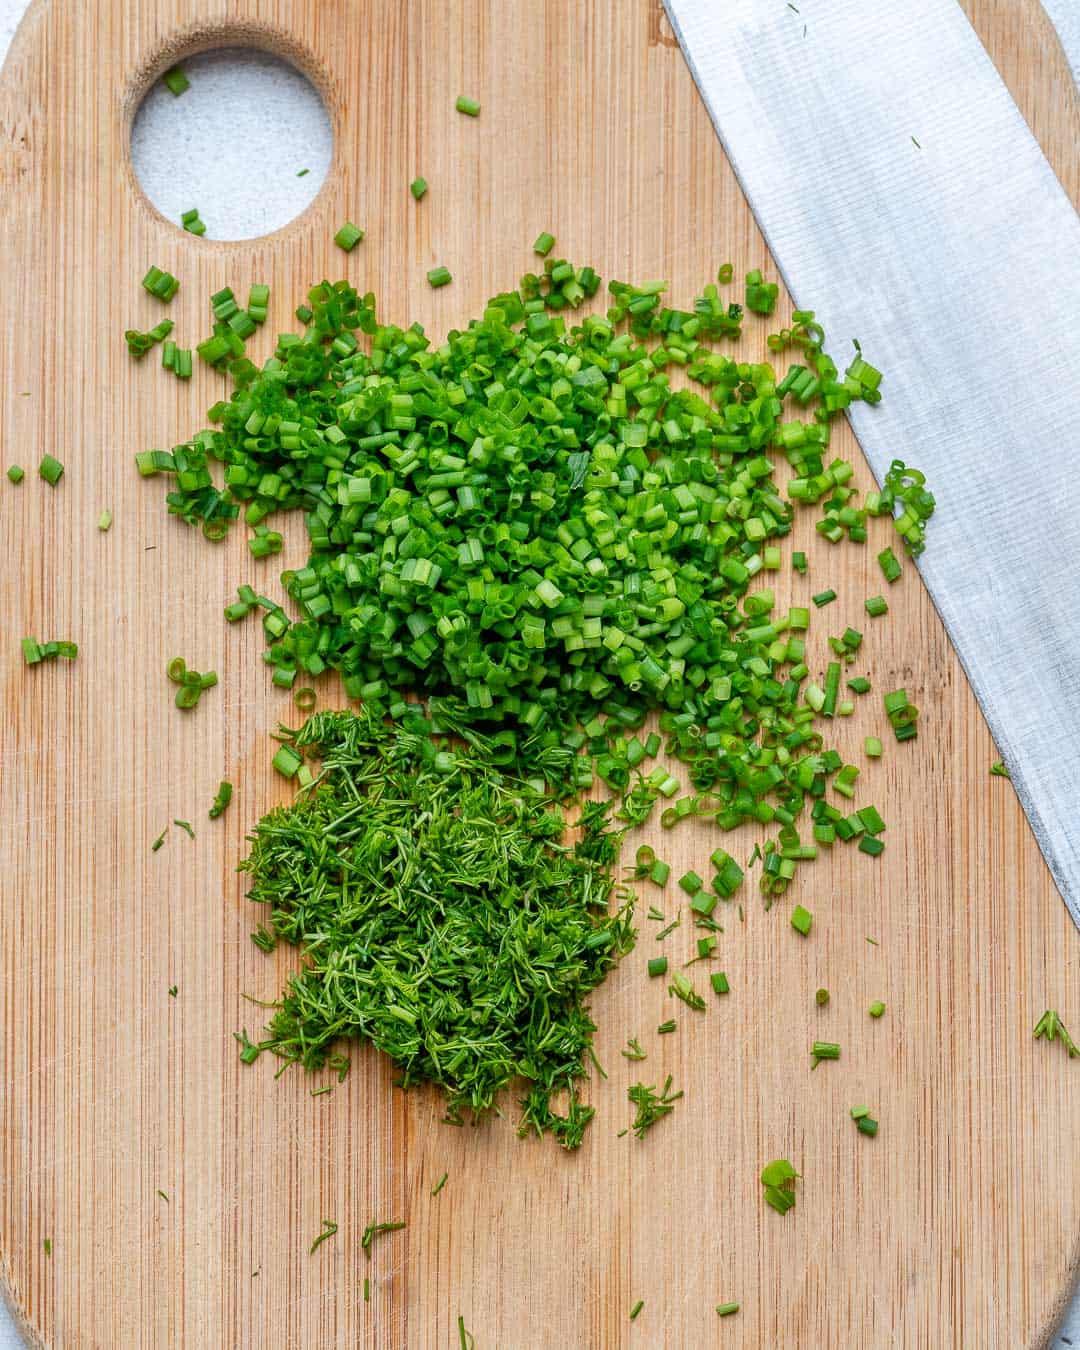 Chop fresh herbs using a sharp knife.